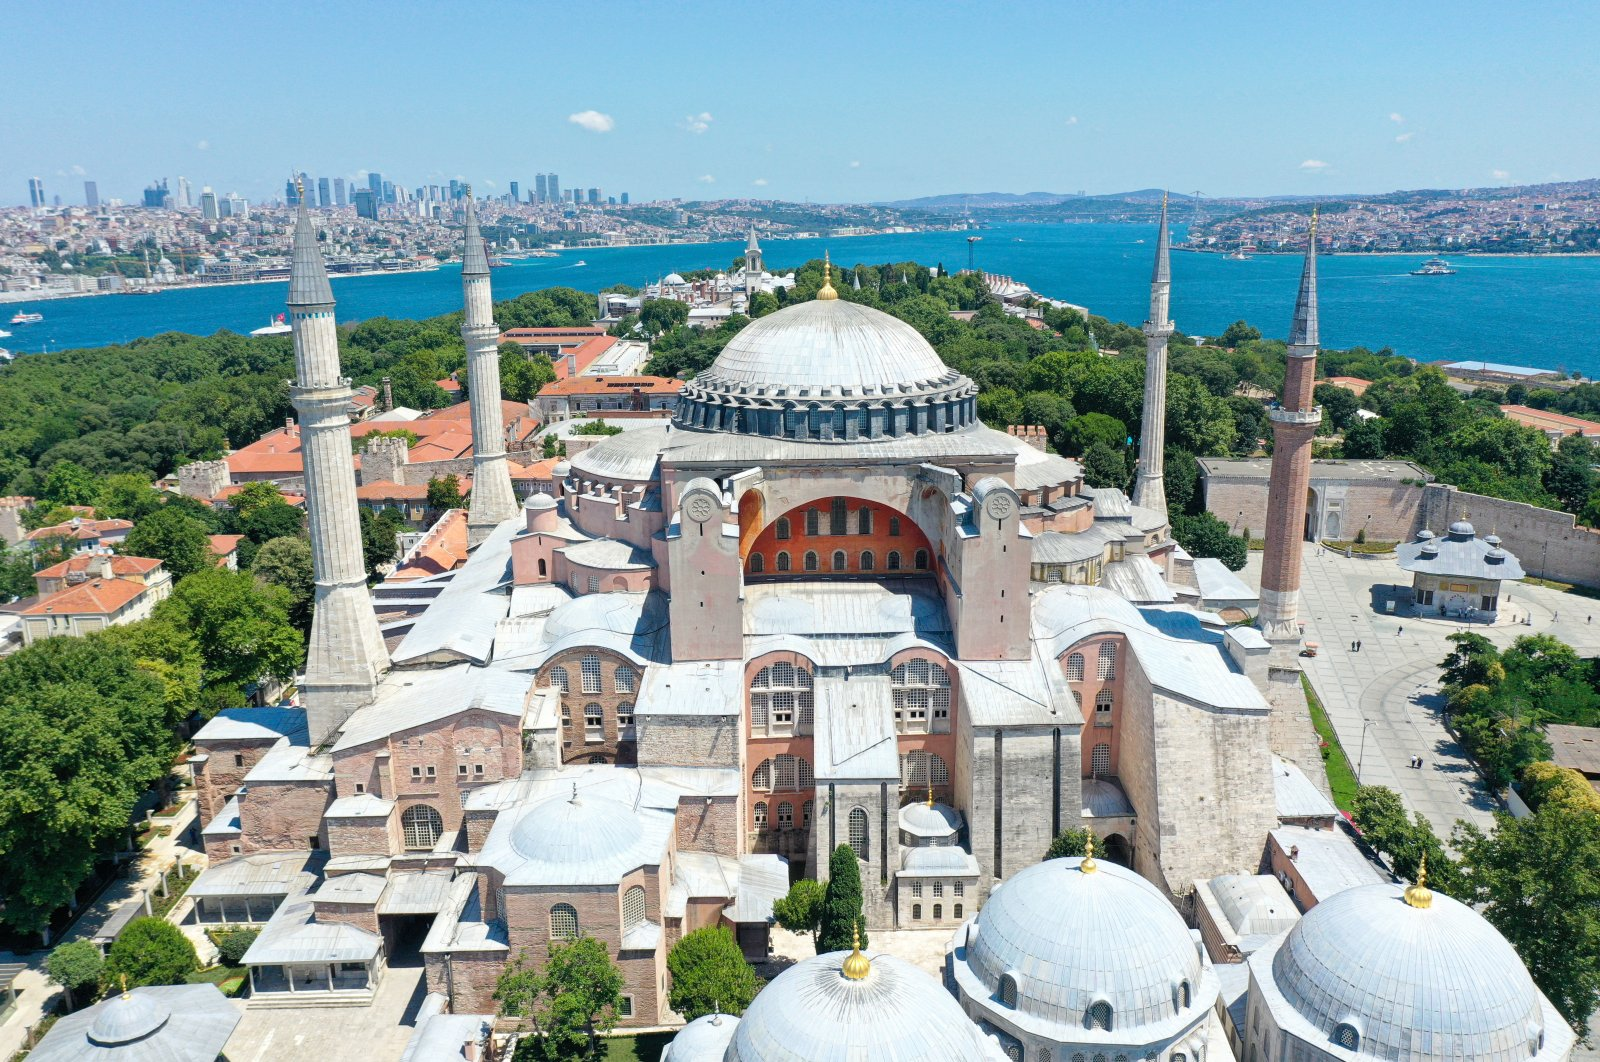 Ibrahim Hakkı Konyalı prevented destruction of the minarets of the Hagia Sophia, seen in this photo provided on July 22, 2020. (AA PHOTO)